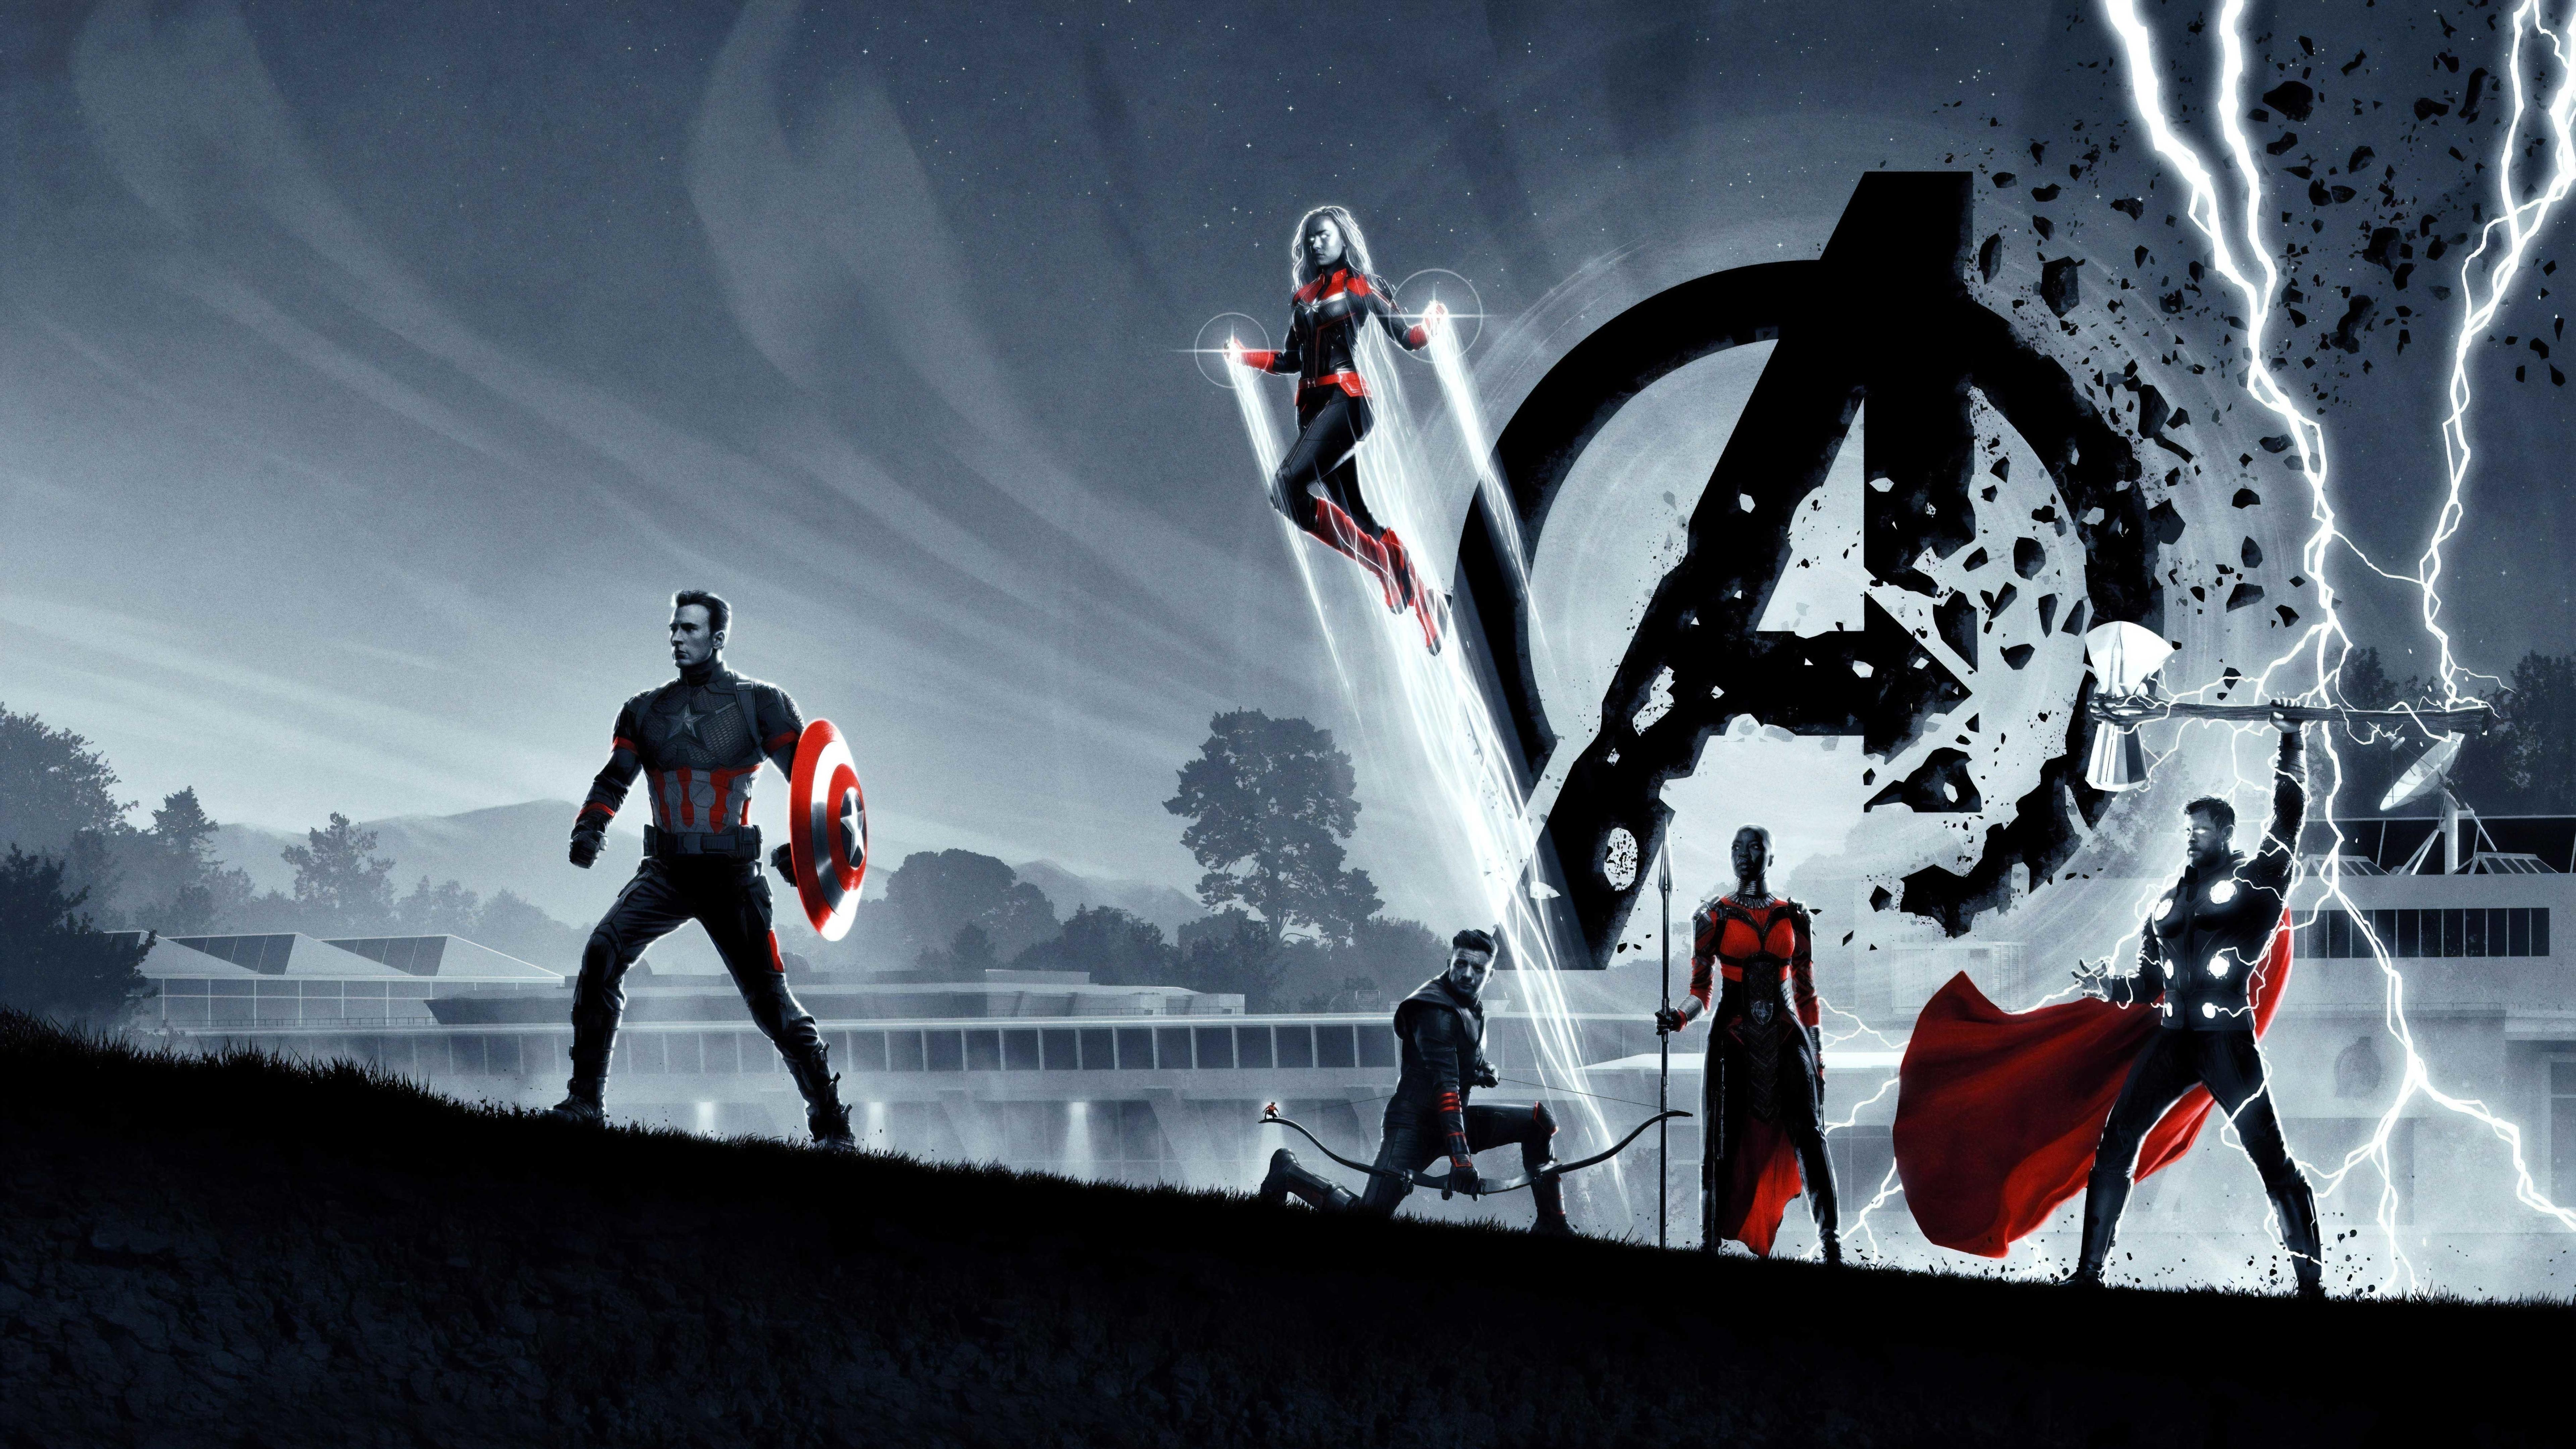 7680x4320 Avengers Endgame 8k Poster 8k Wallpaper Hd Movies